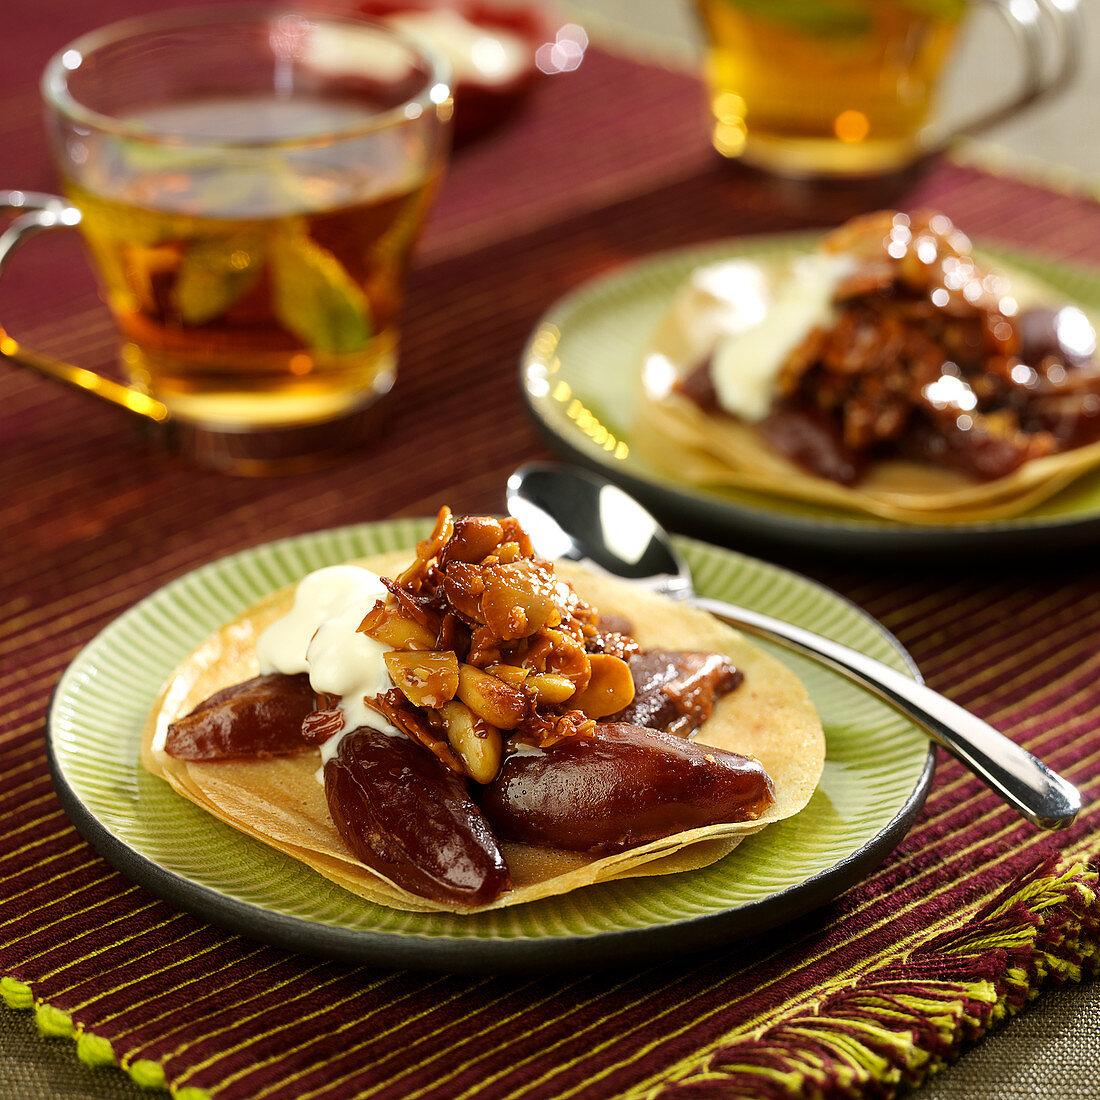 Date, almond, walnut and pine nut honey crisp dessert